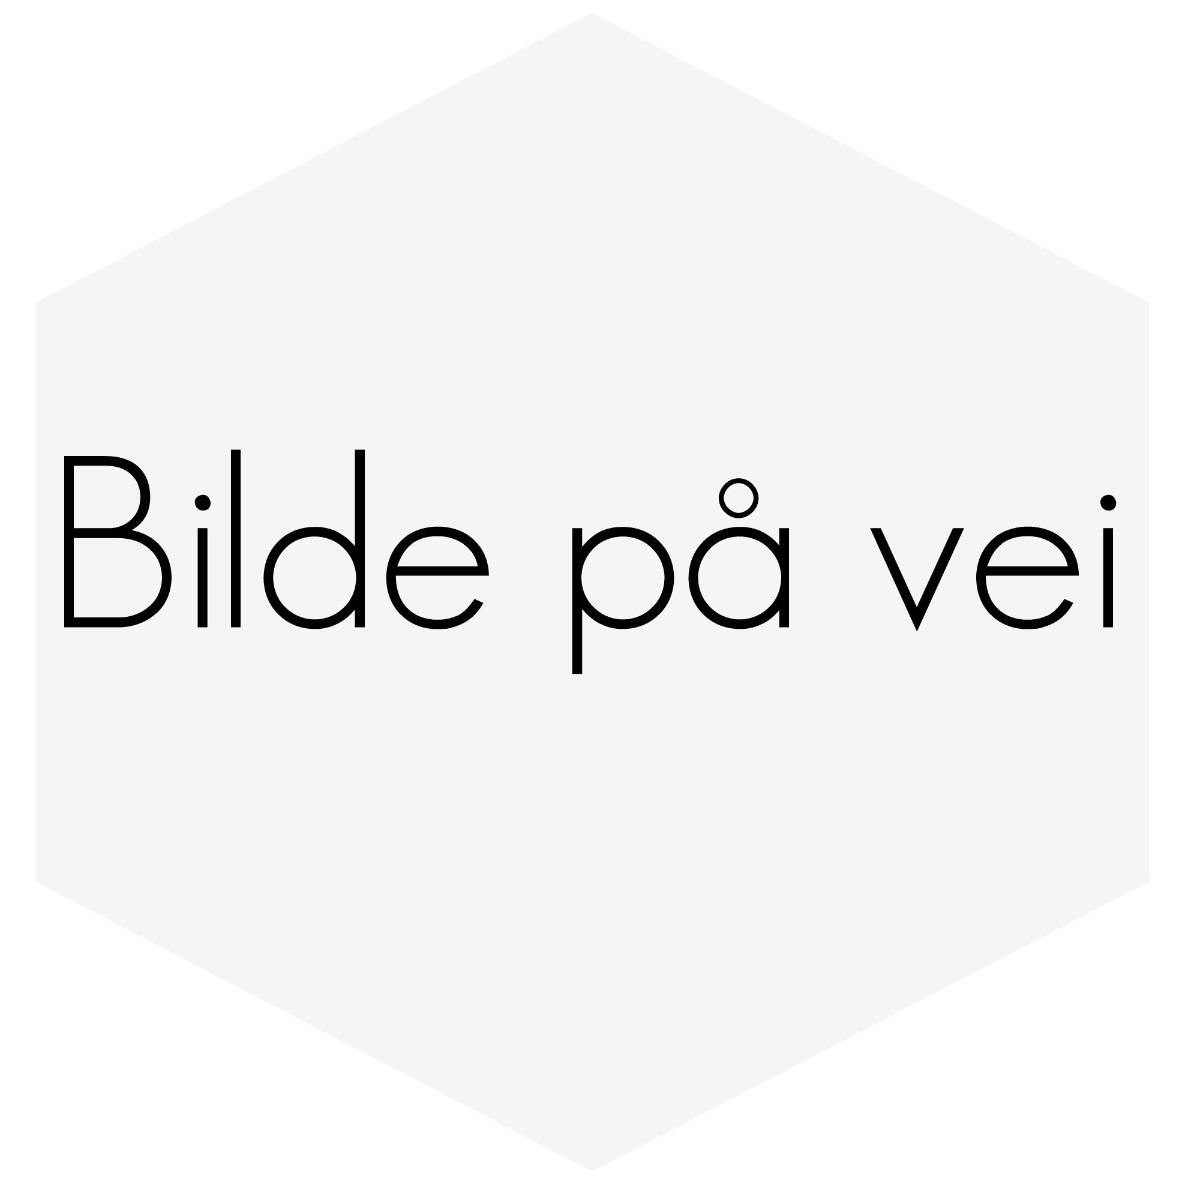 BLINKLAMPE S/V40-2001>04 VenstreTYP M/SVART RUNDT REFLEKTOR